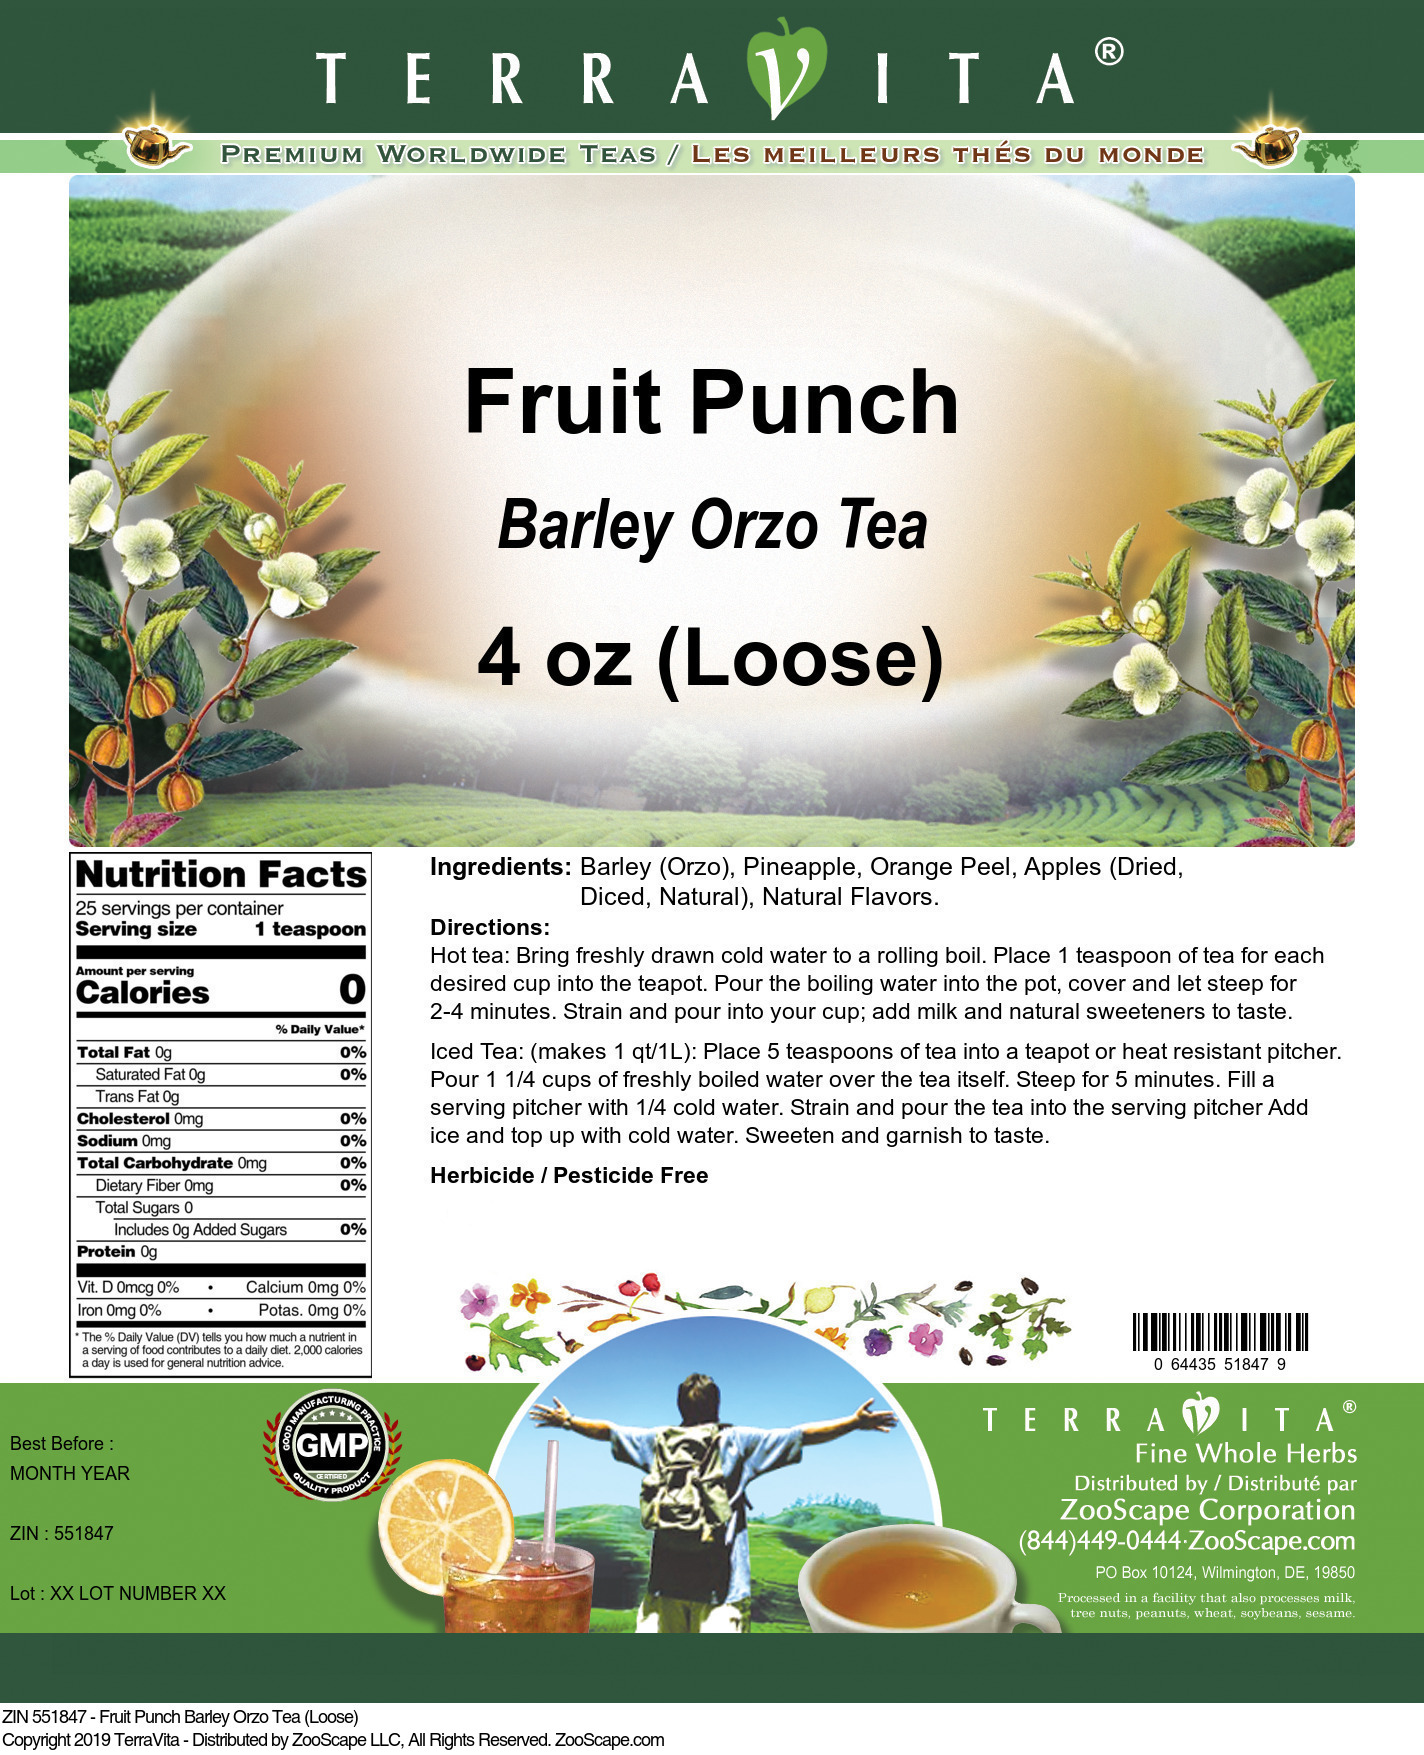 Fruit Punch Barley Orzo